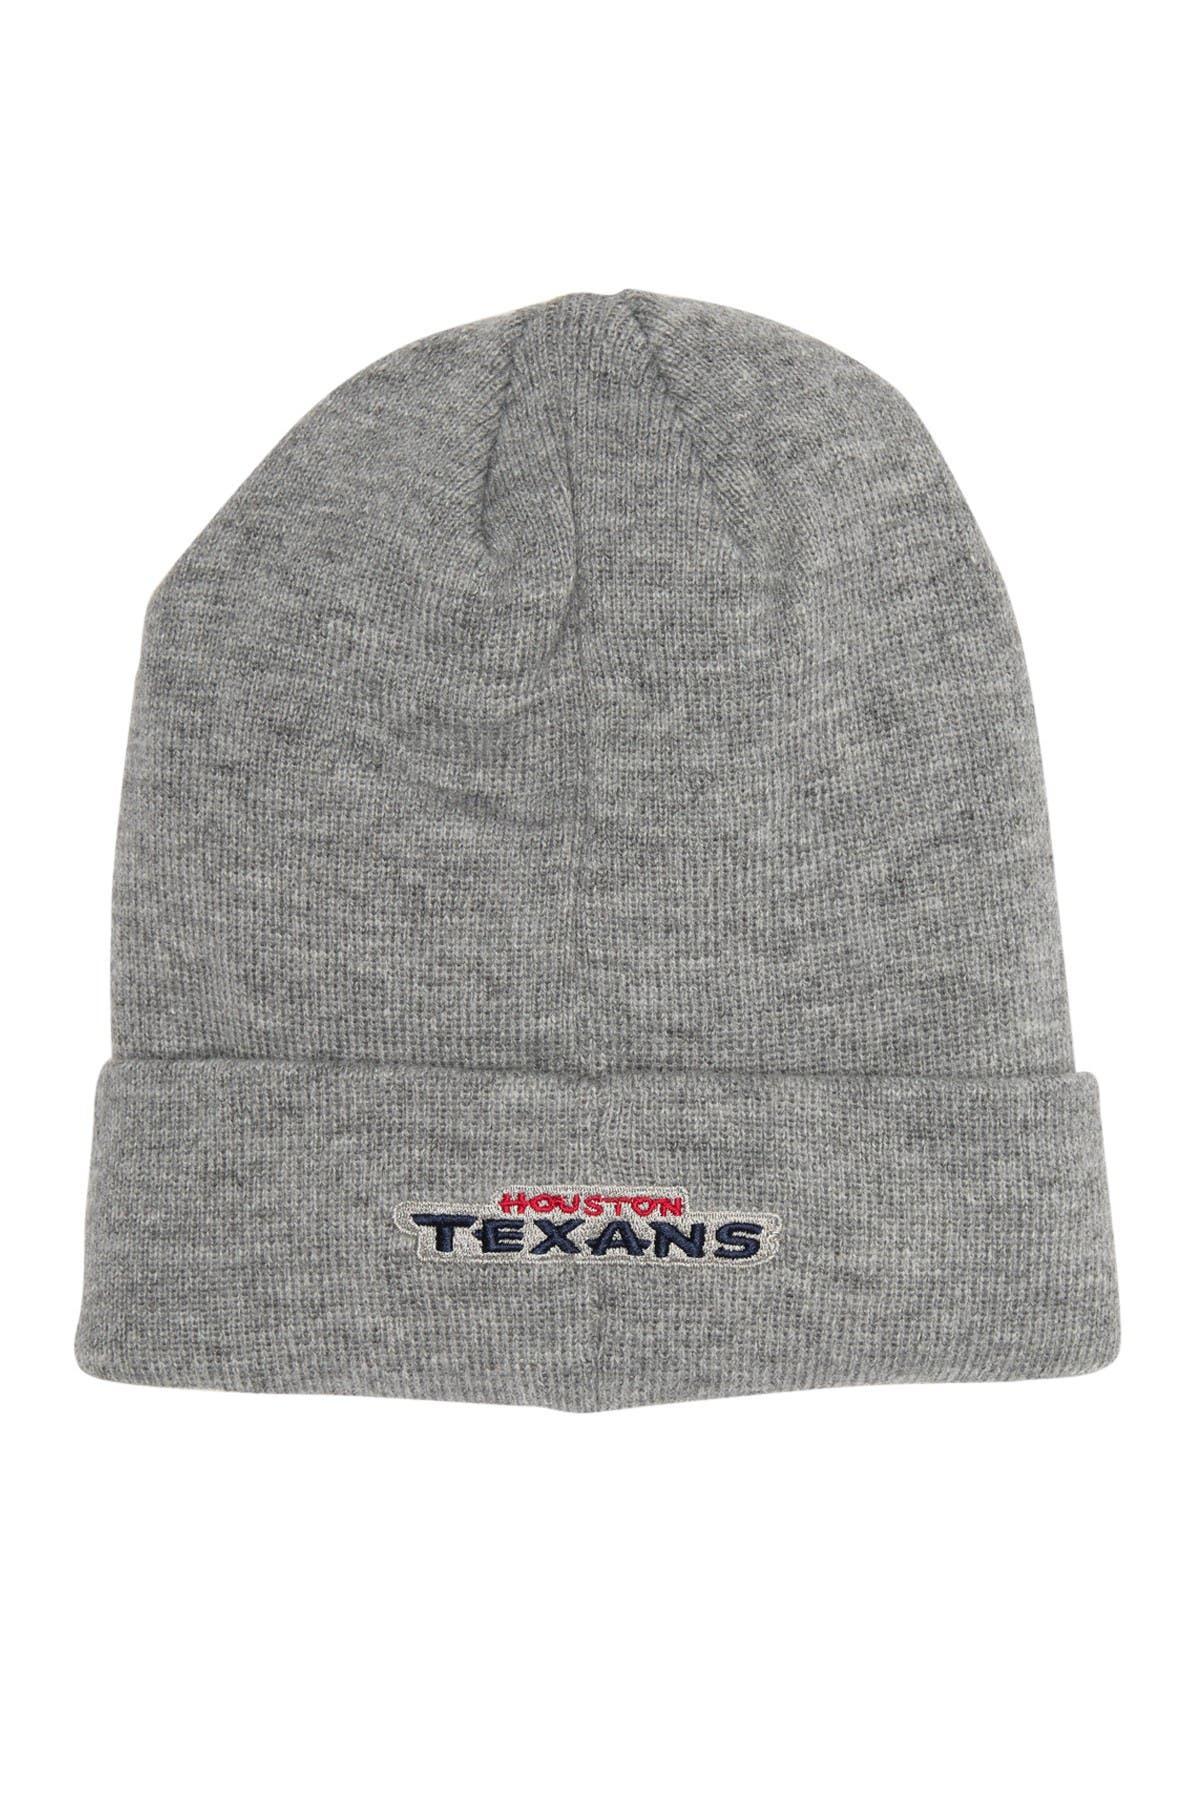 Image of NFL Logo NFL Houston Texans Beanie Hat